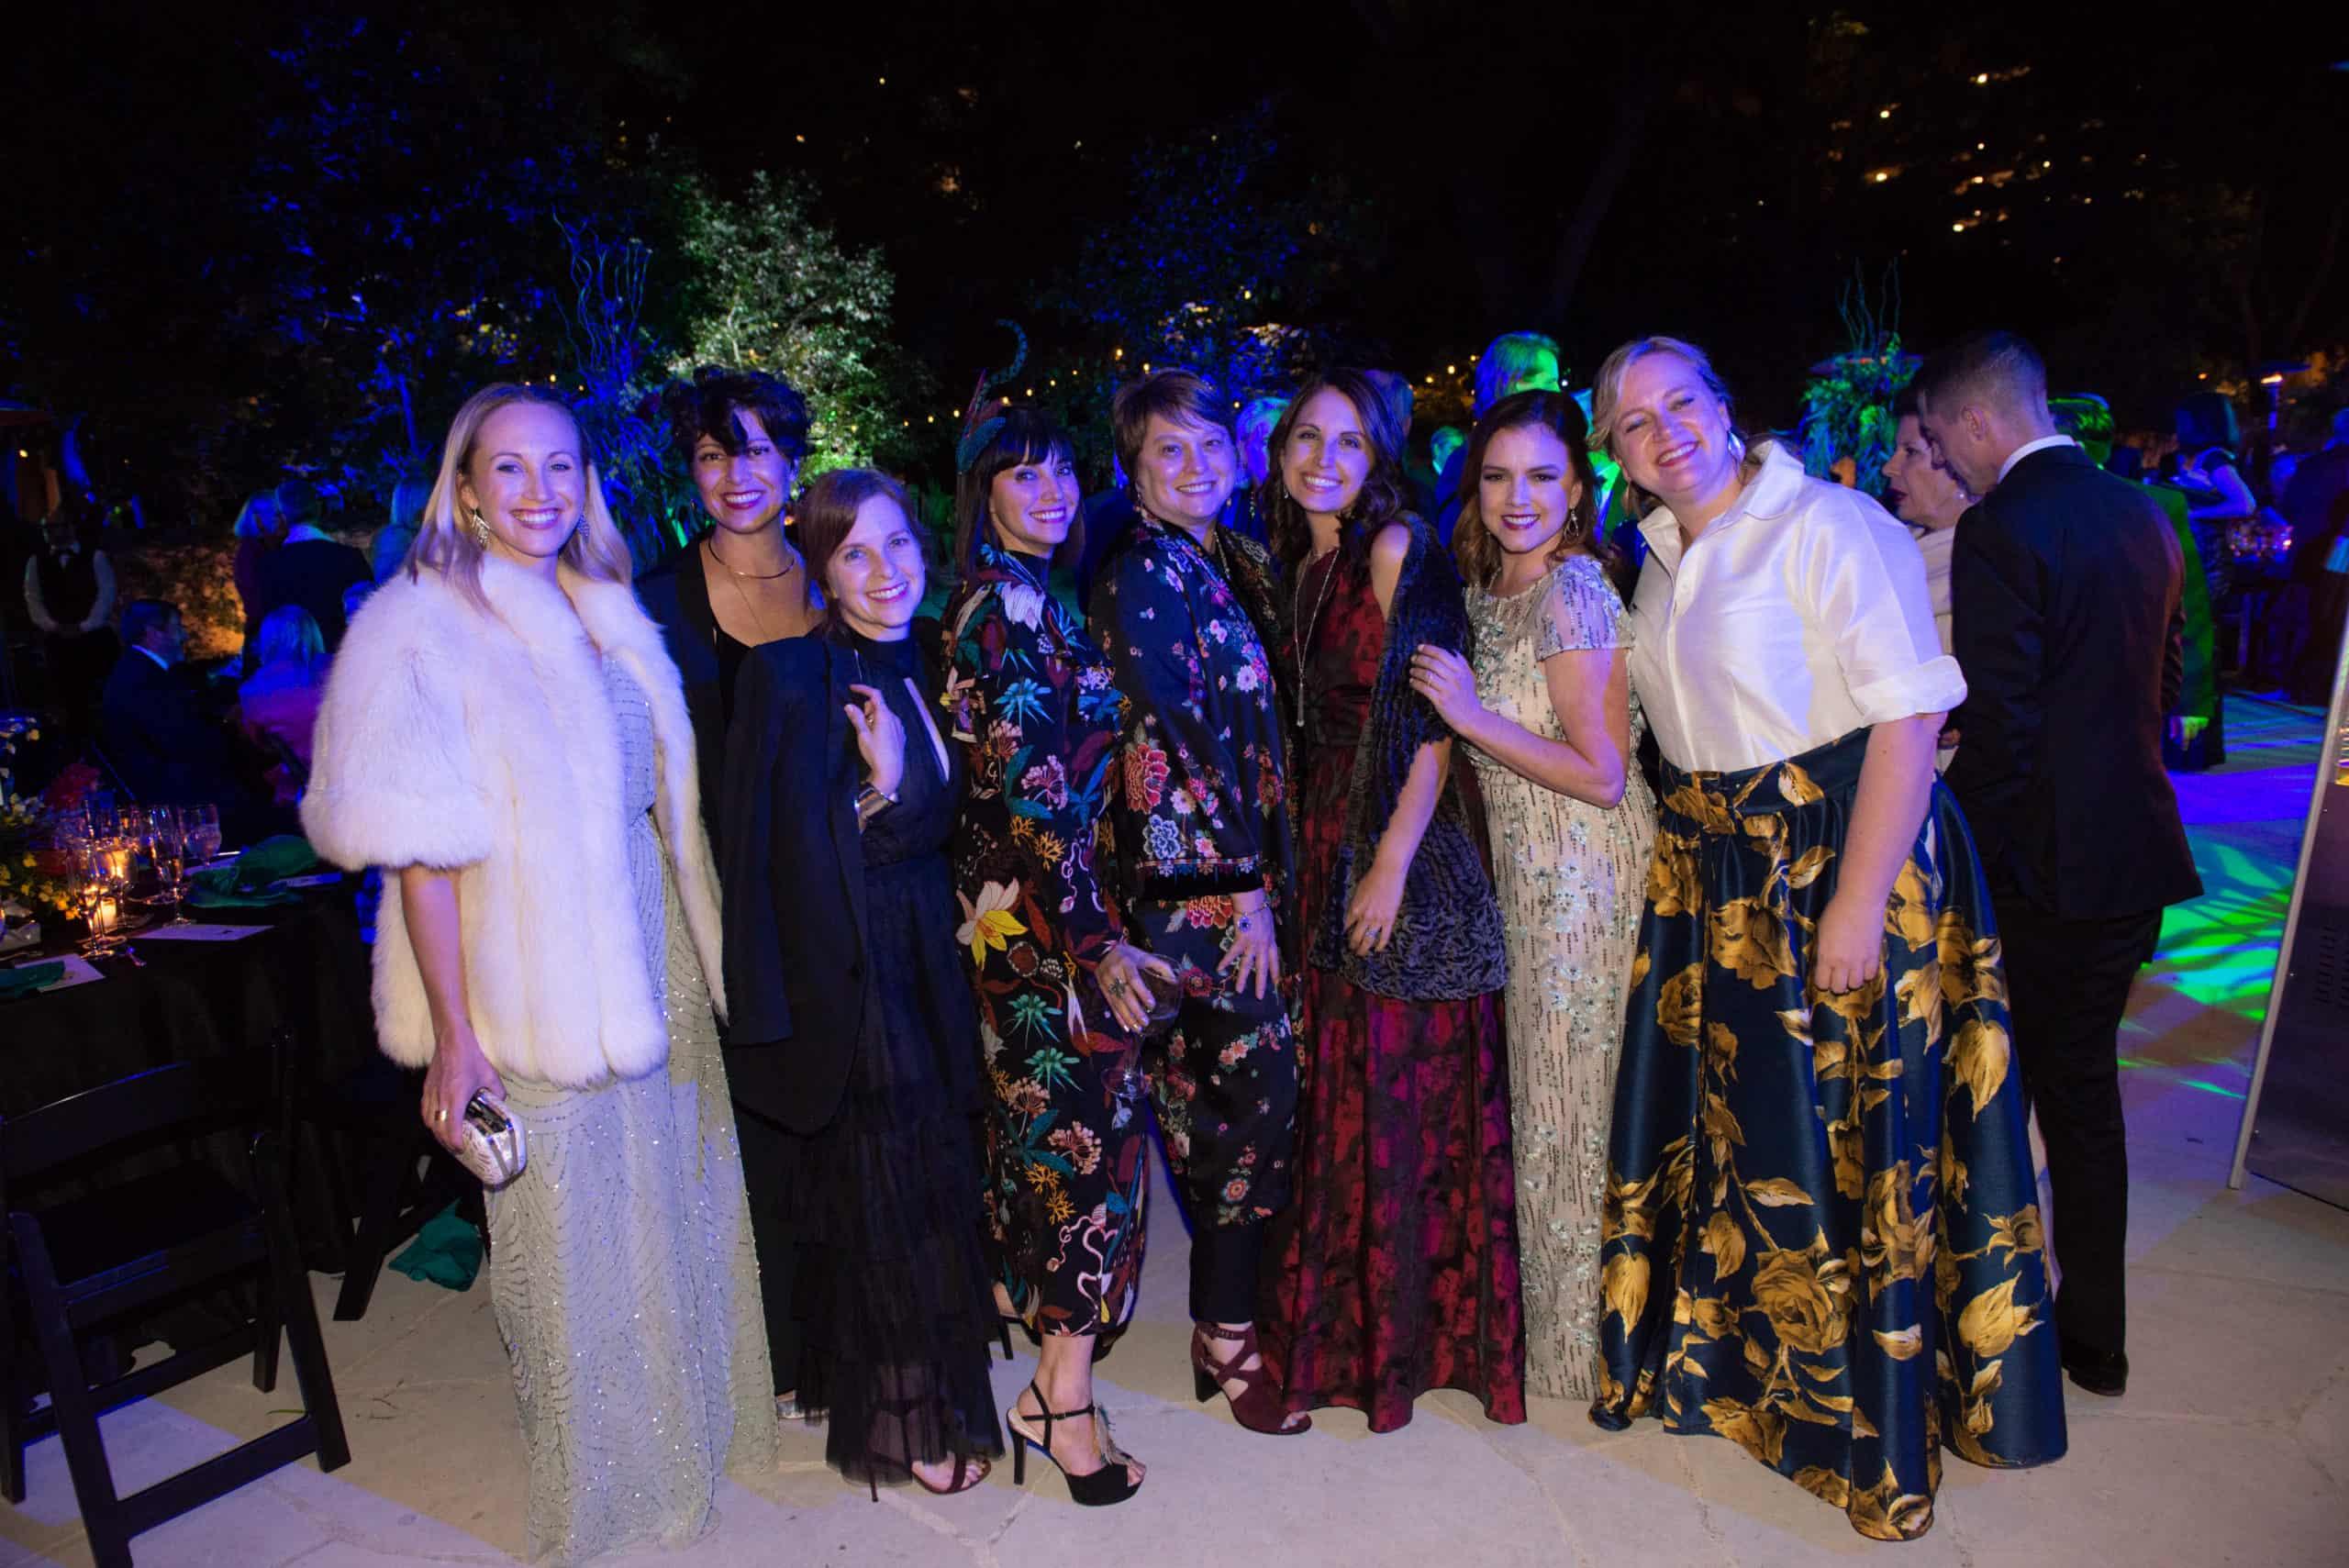 Lindsey Tognietti, Annie Vance, Sarah Herr, Sommer Mello, Lisa Lemire, Lauren Noriega, Nicole Marold and Amy Zink